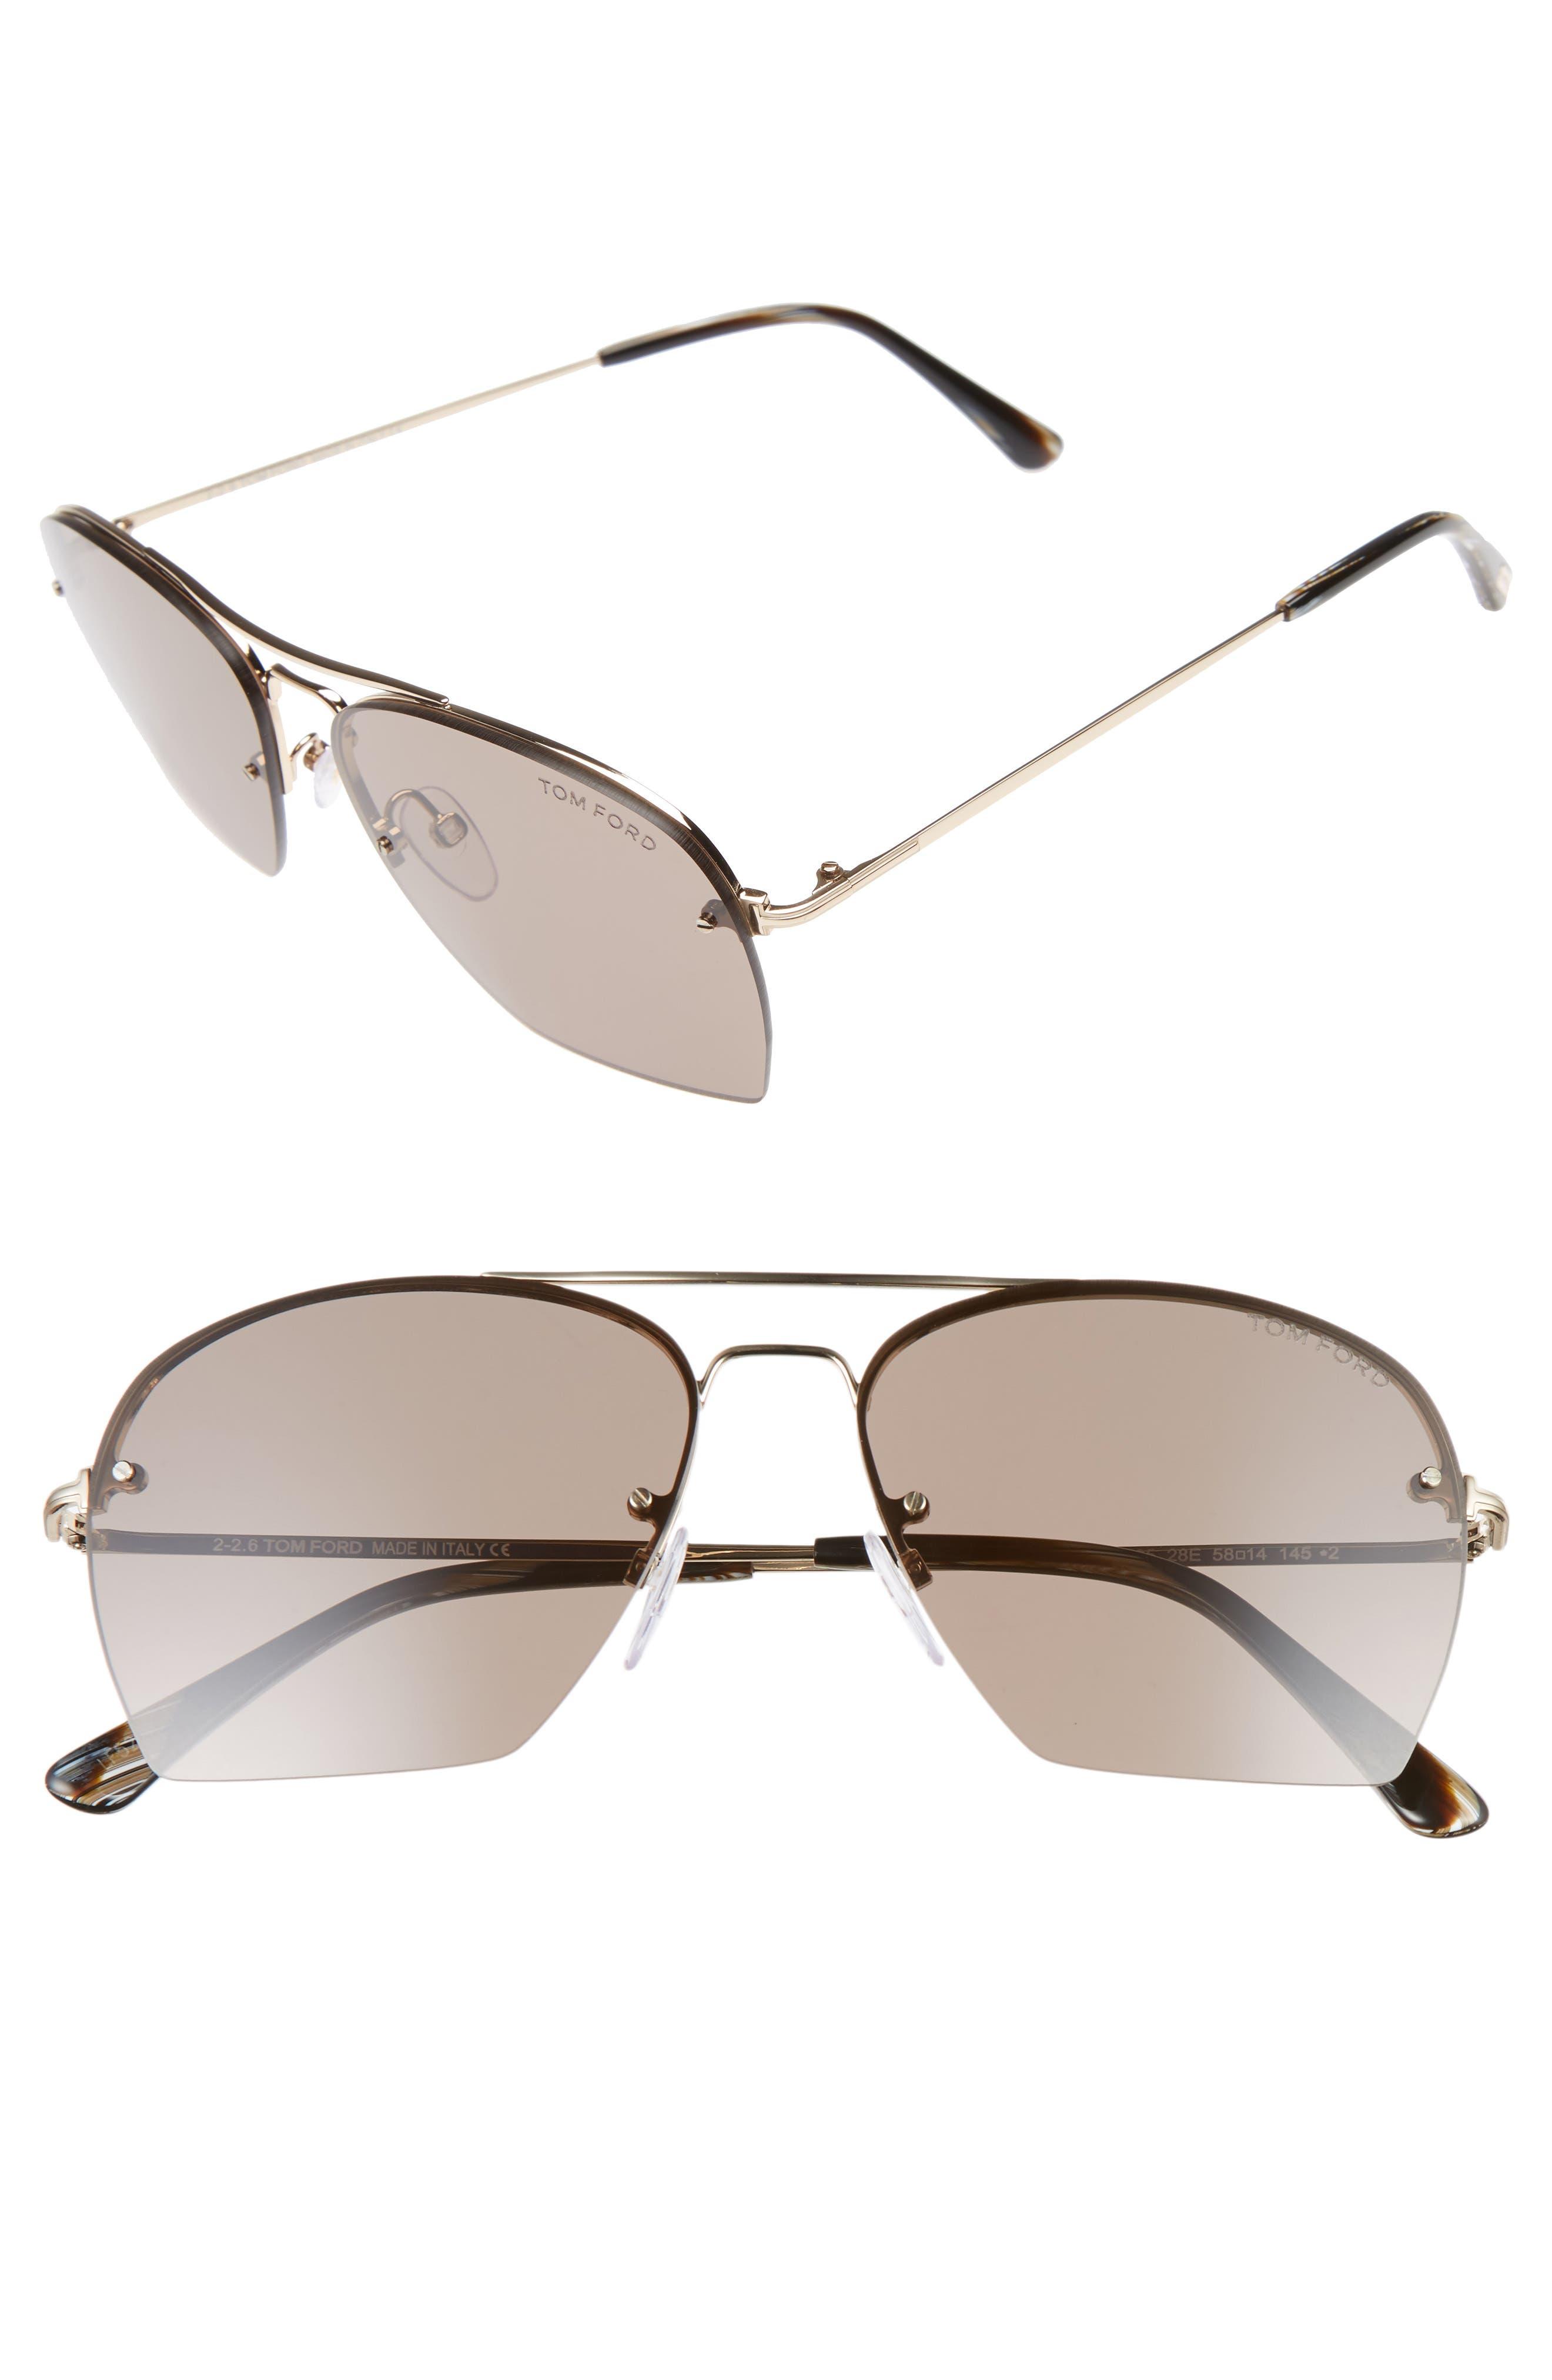 Whelan 58mm Aviator Sunglasses,                             Main thumbnail 1, color,                             710